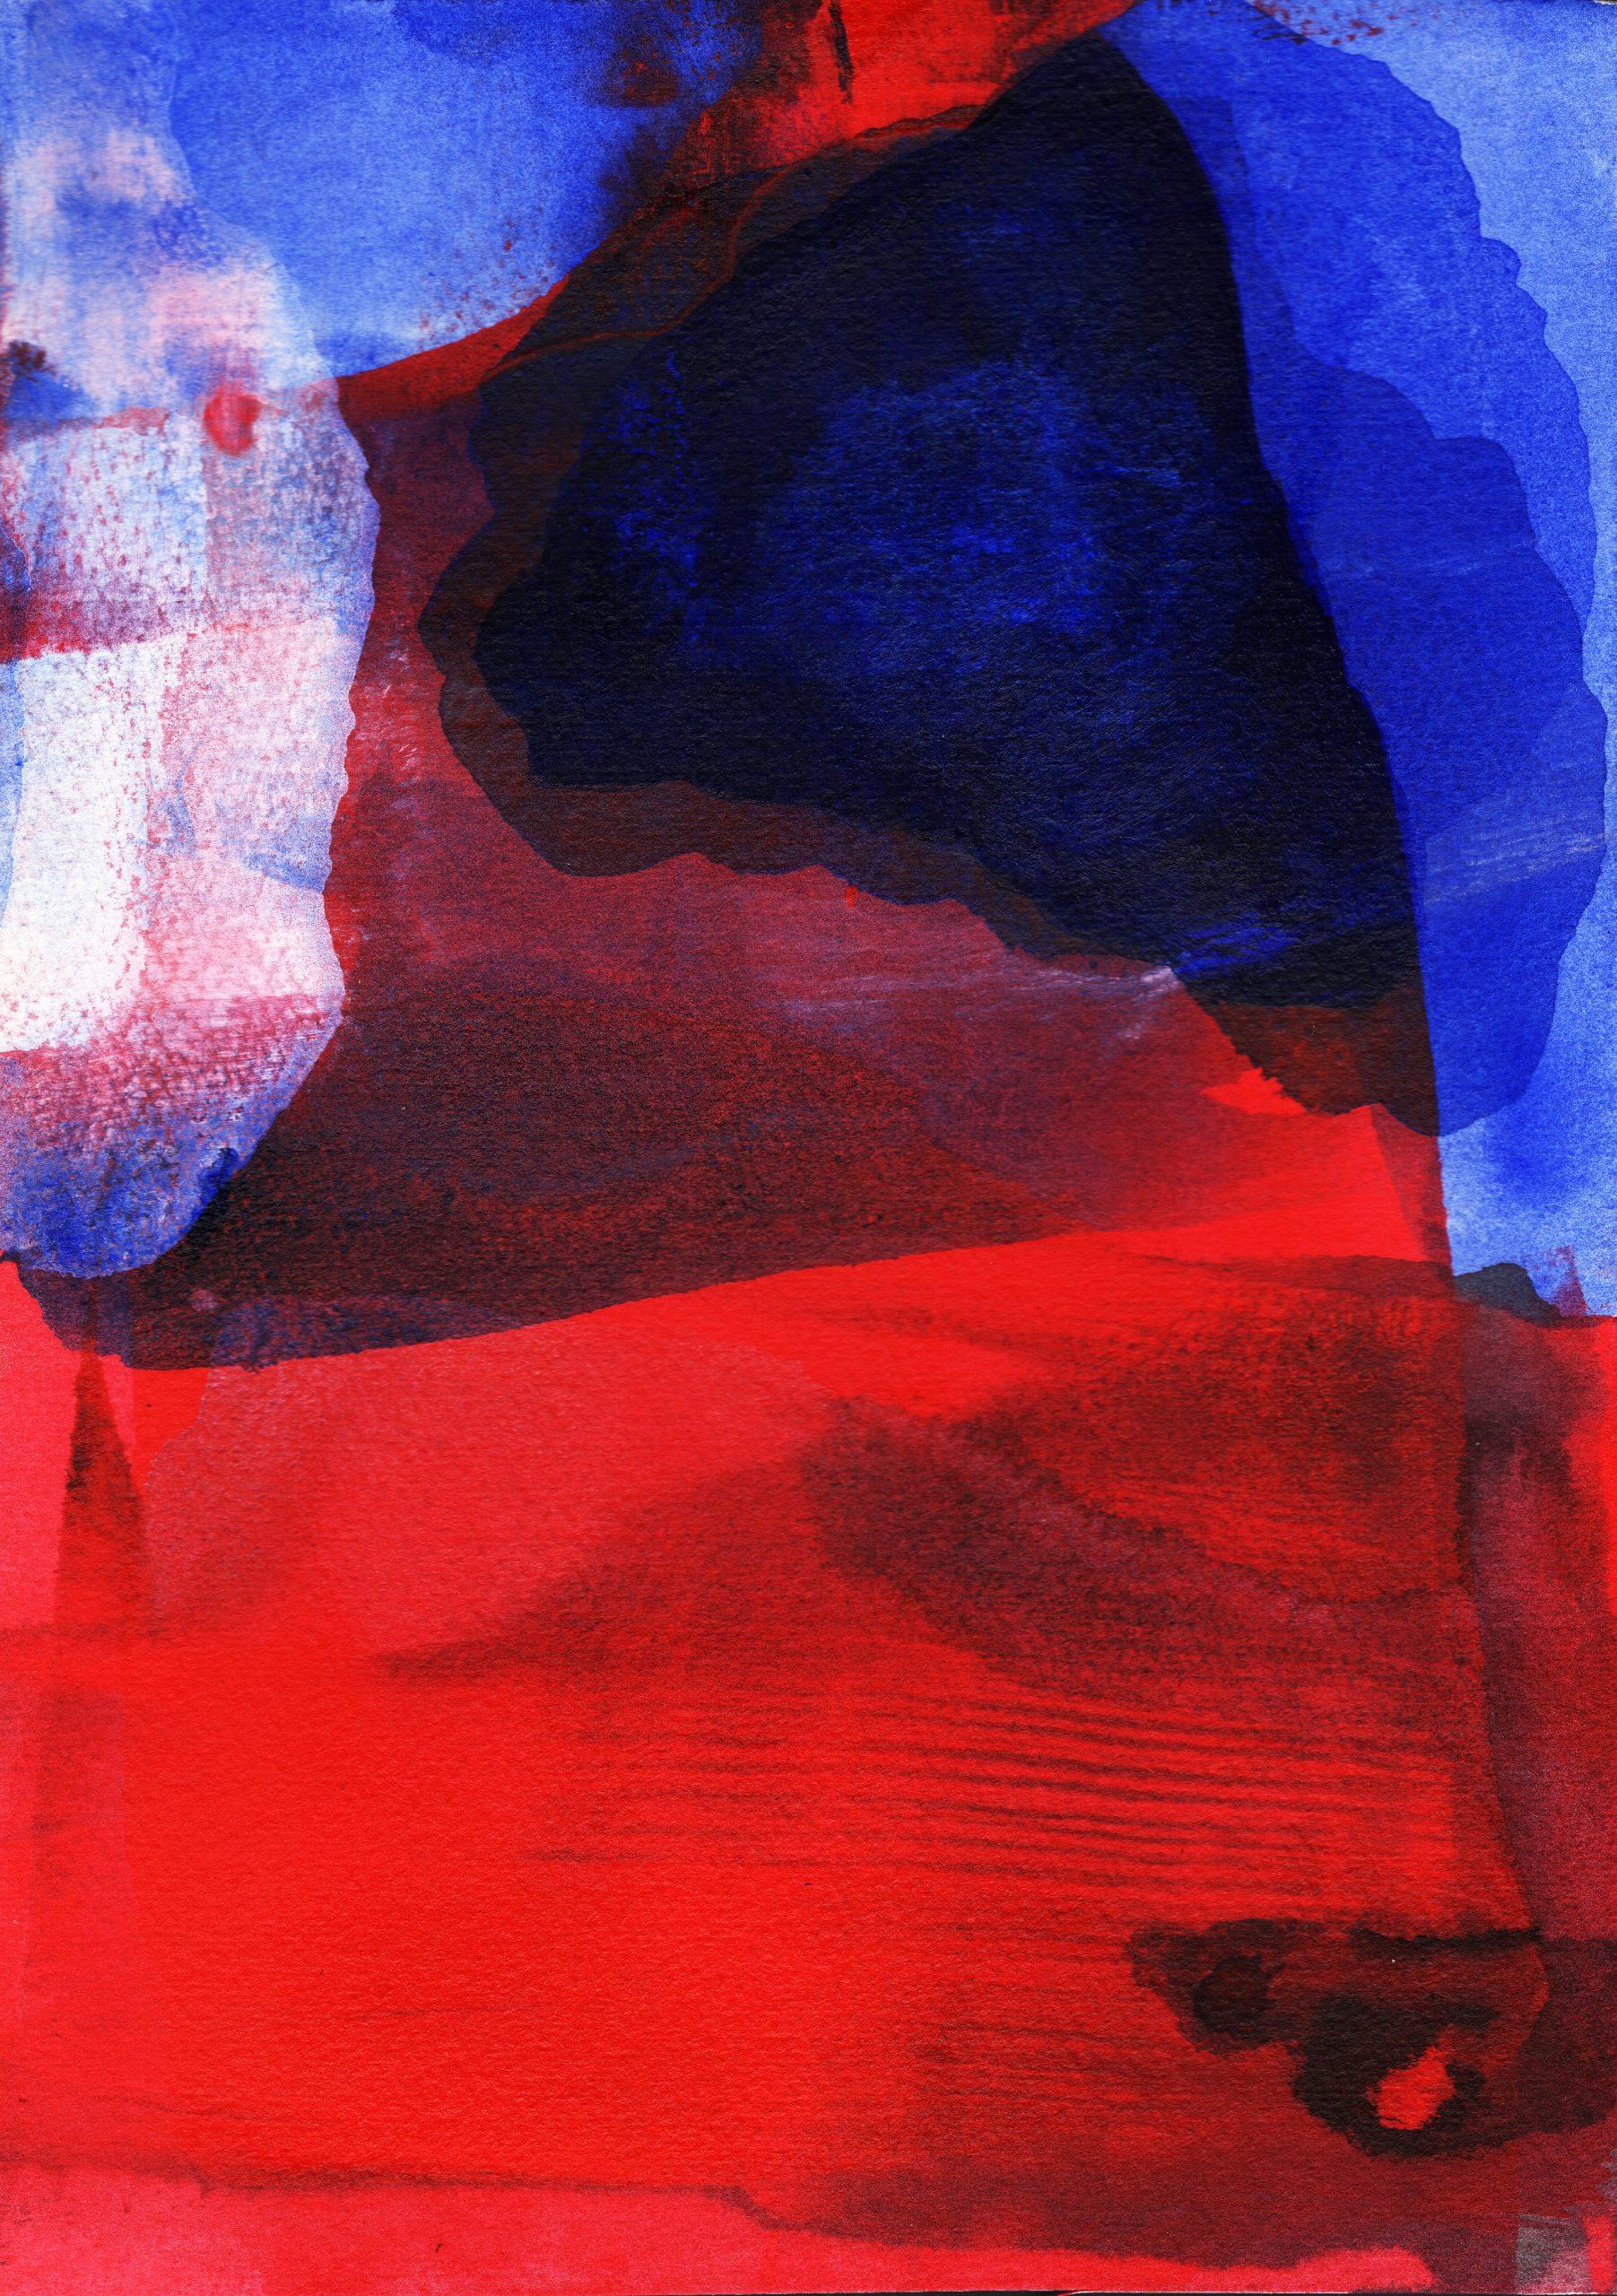 (12) Susana Depetris - Red and Blue Image